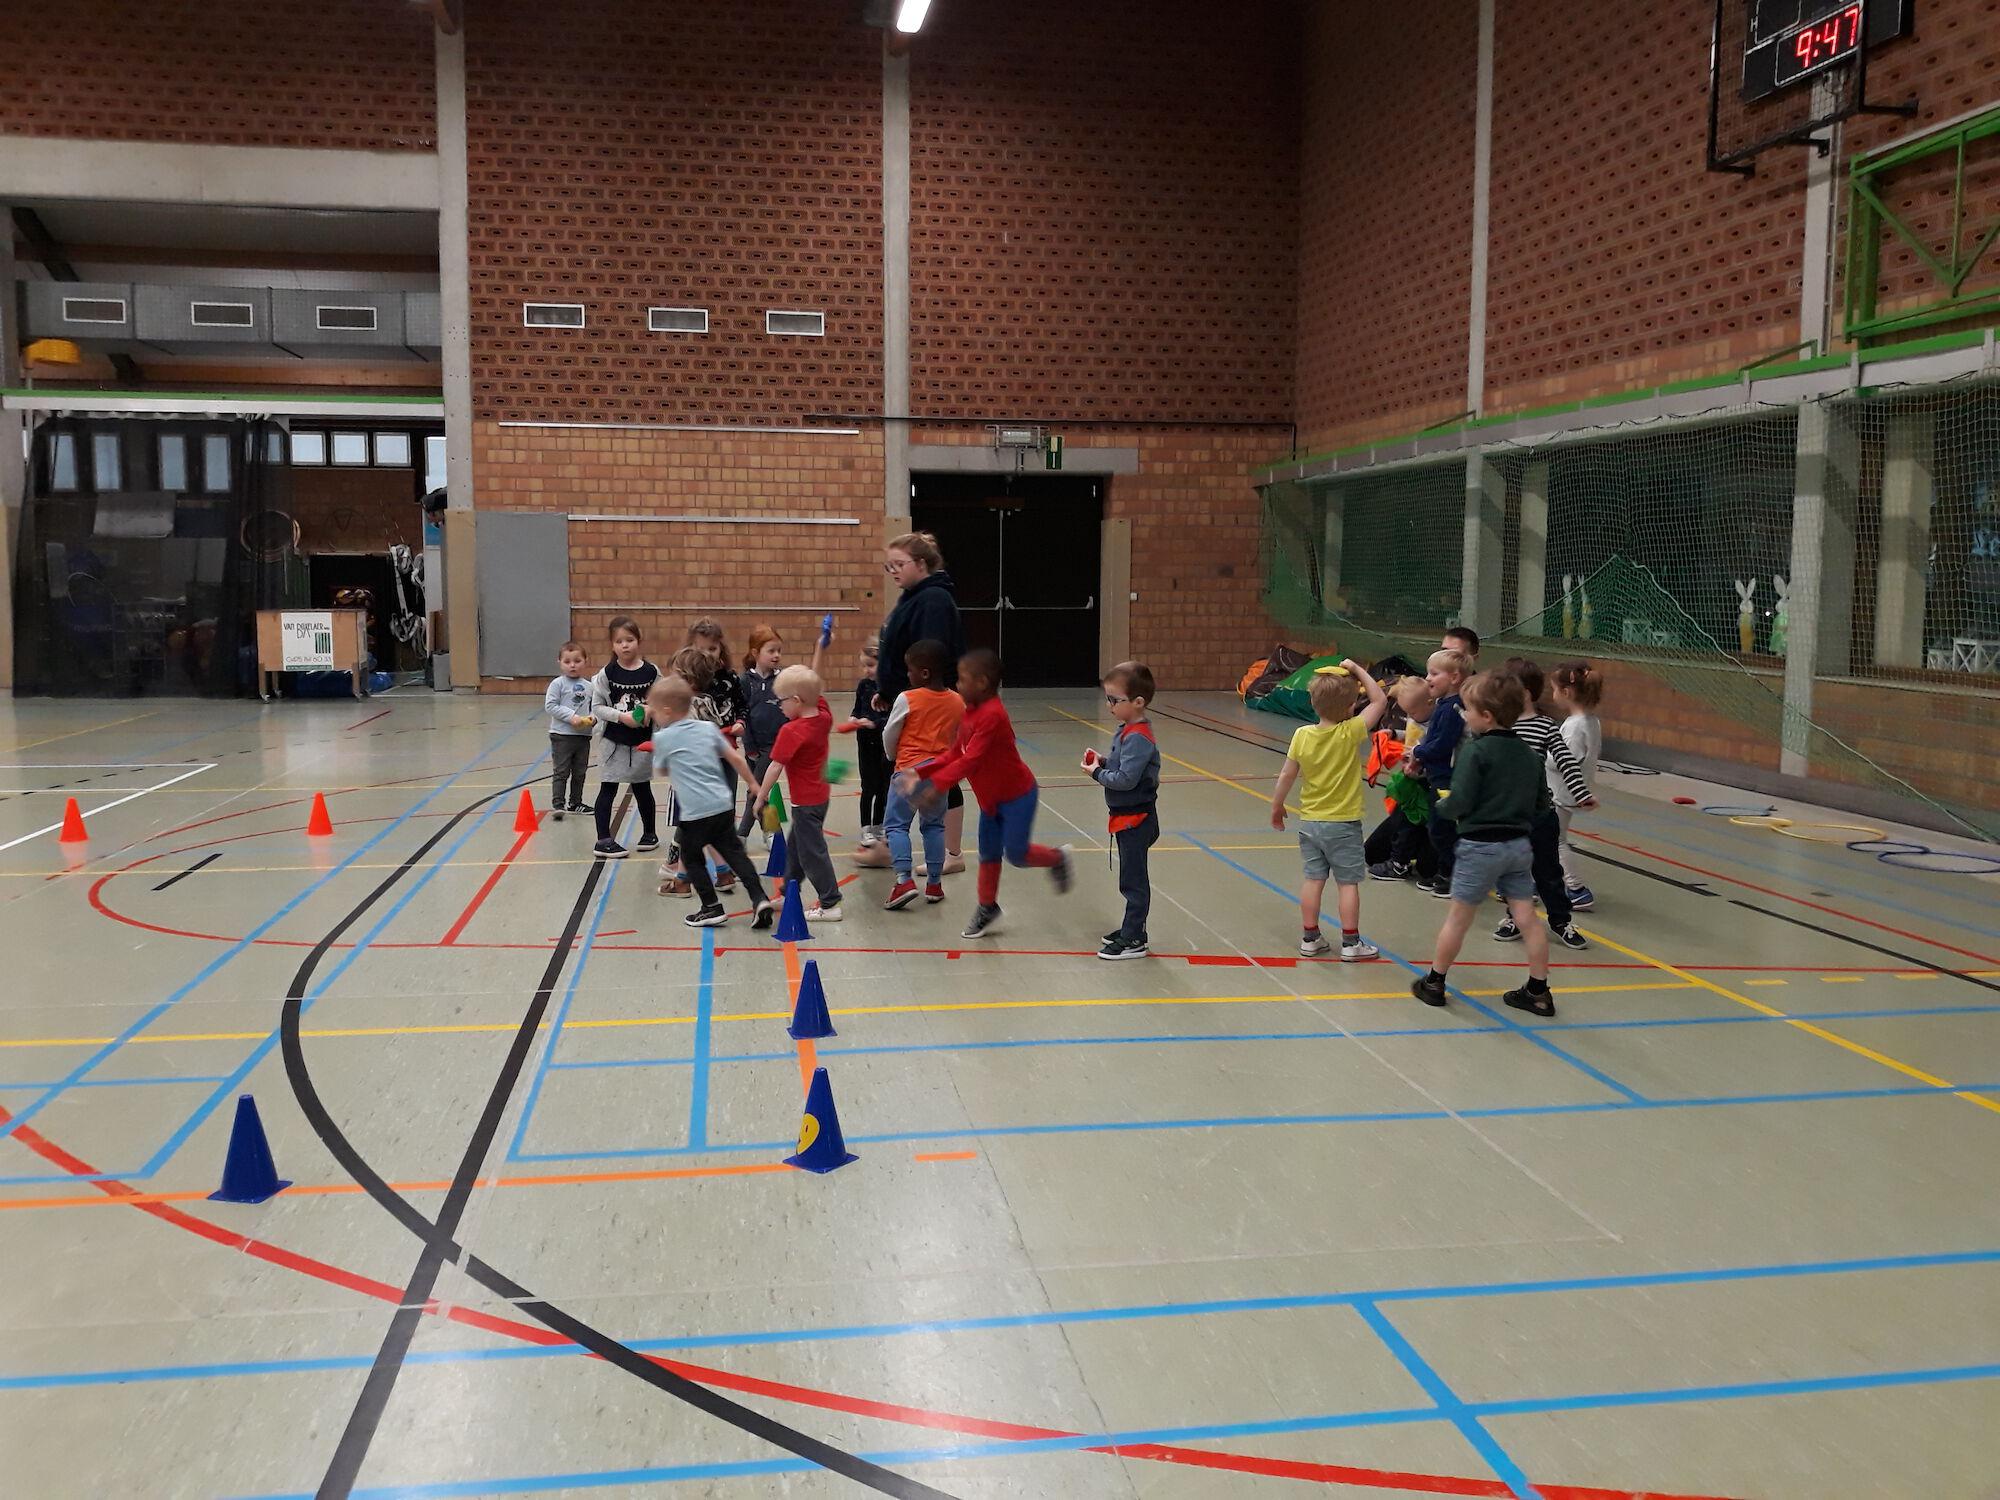 Sportkampen krokus 2019